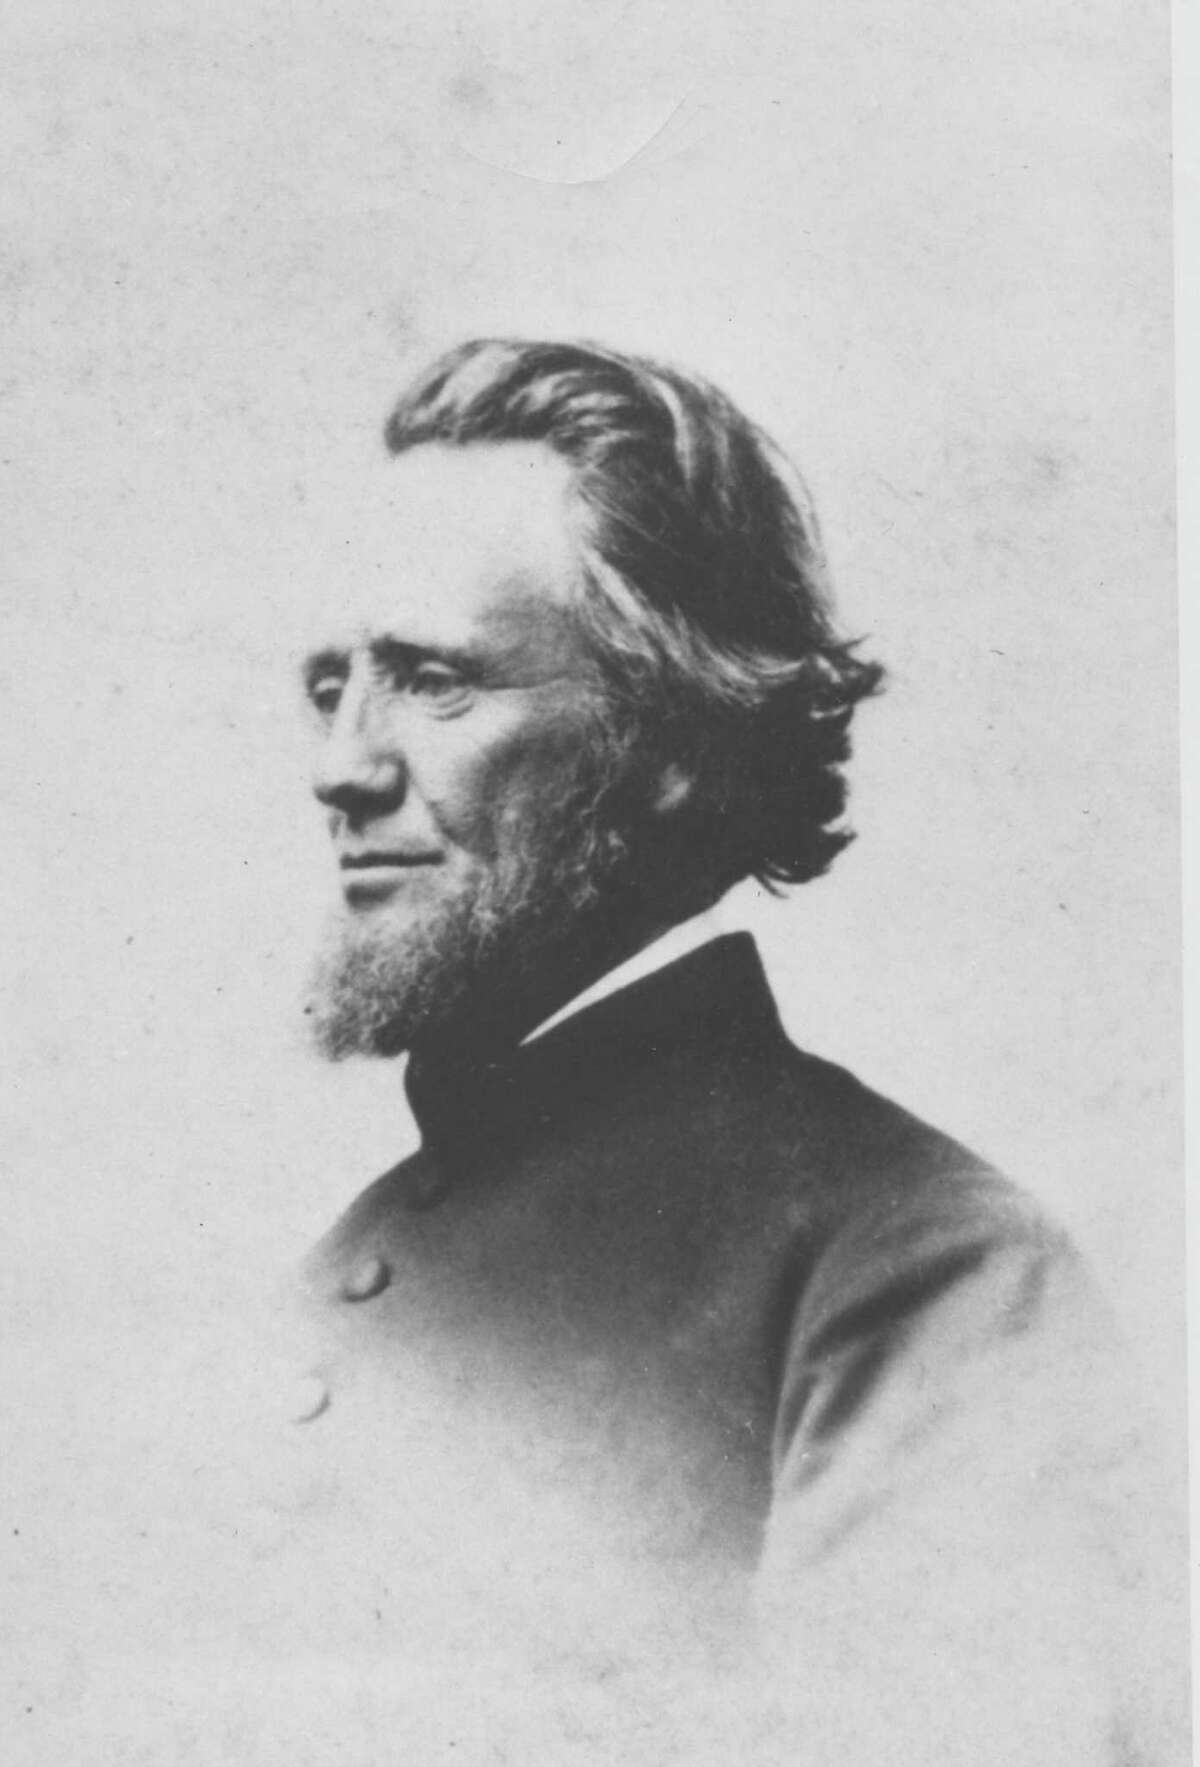 Frederick Gunn